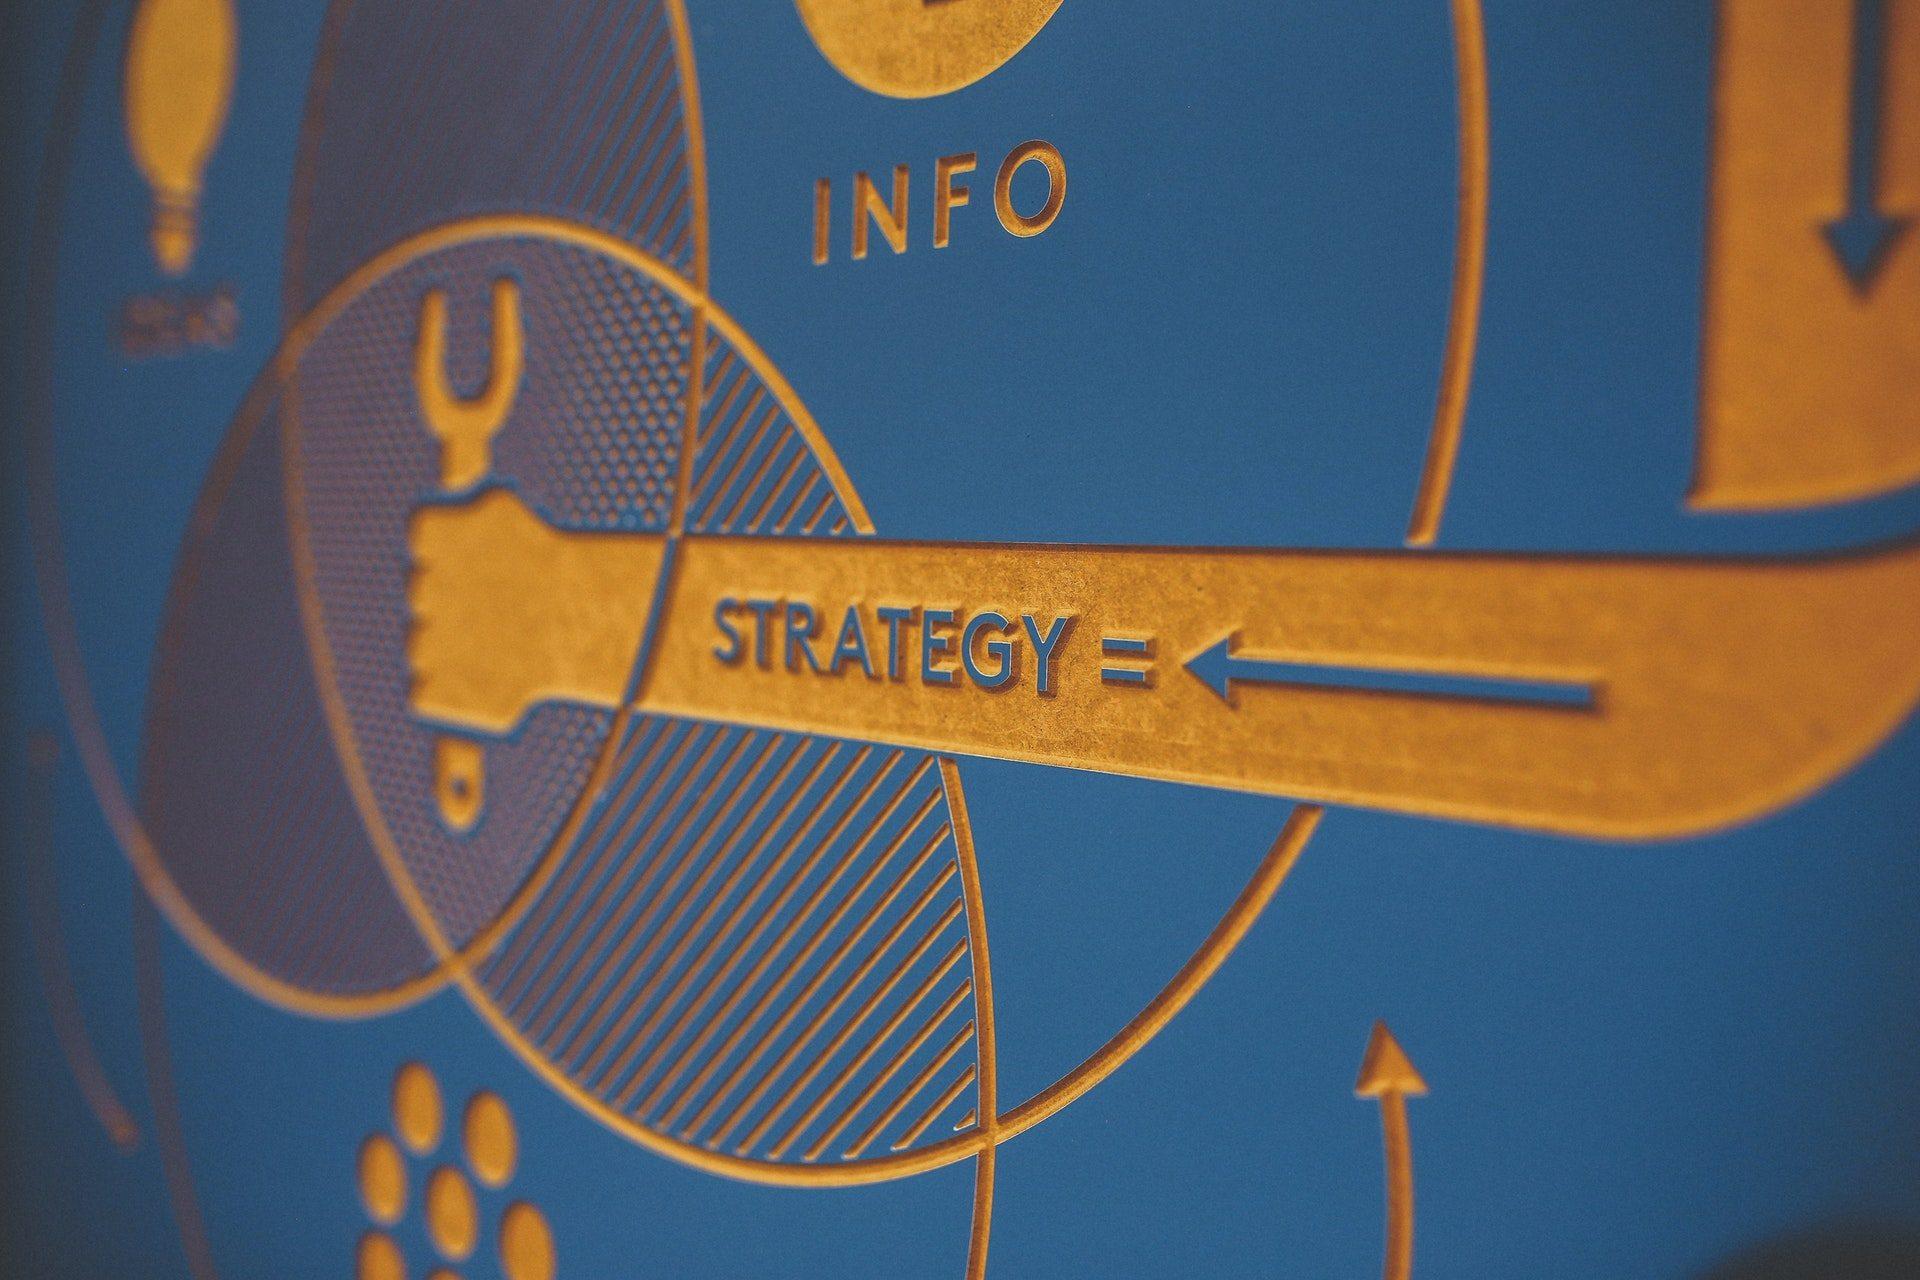 marketing strategy board